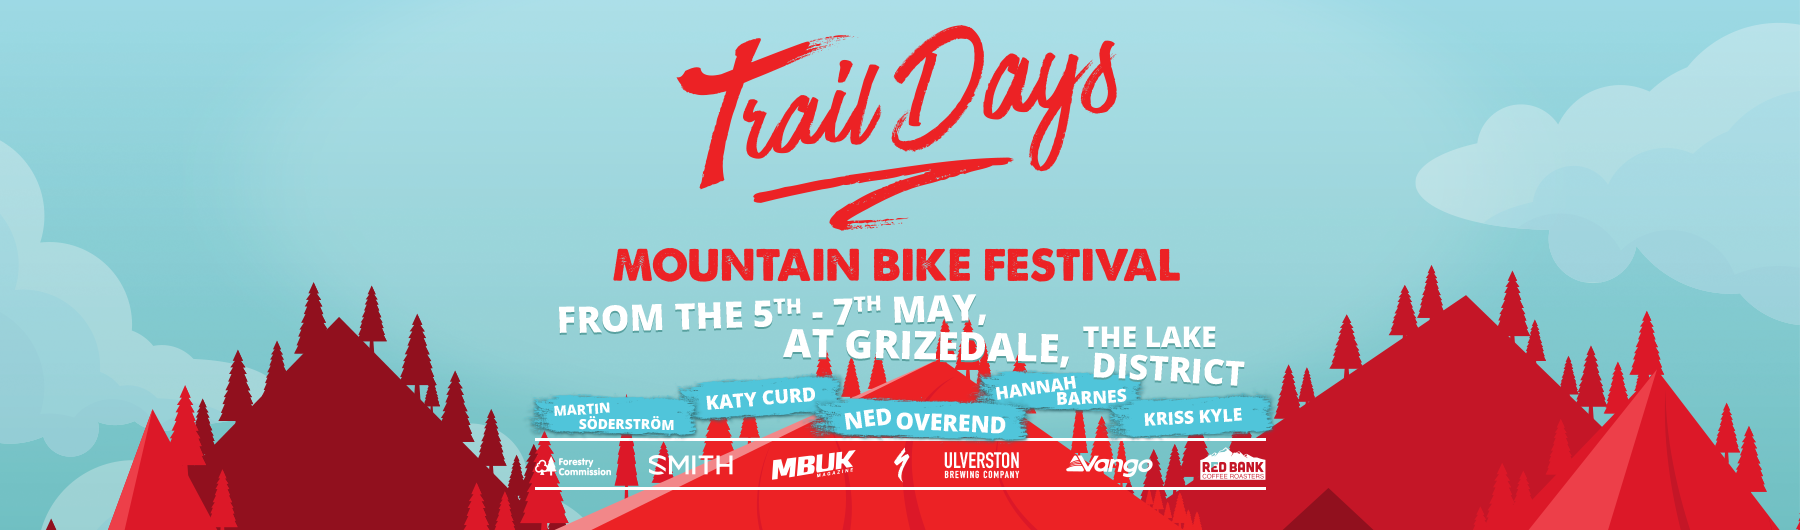 Trail Days - 2018